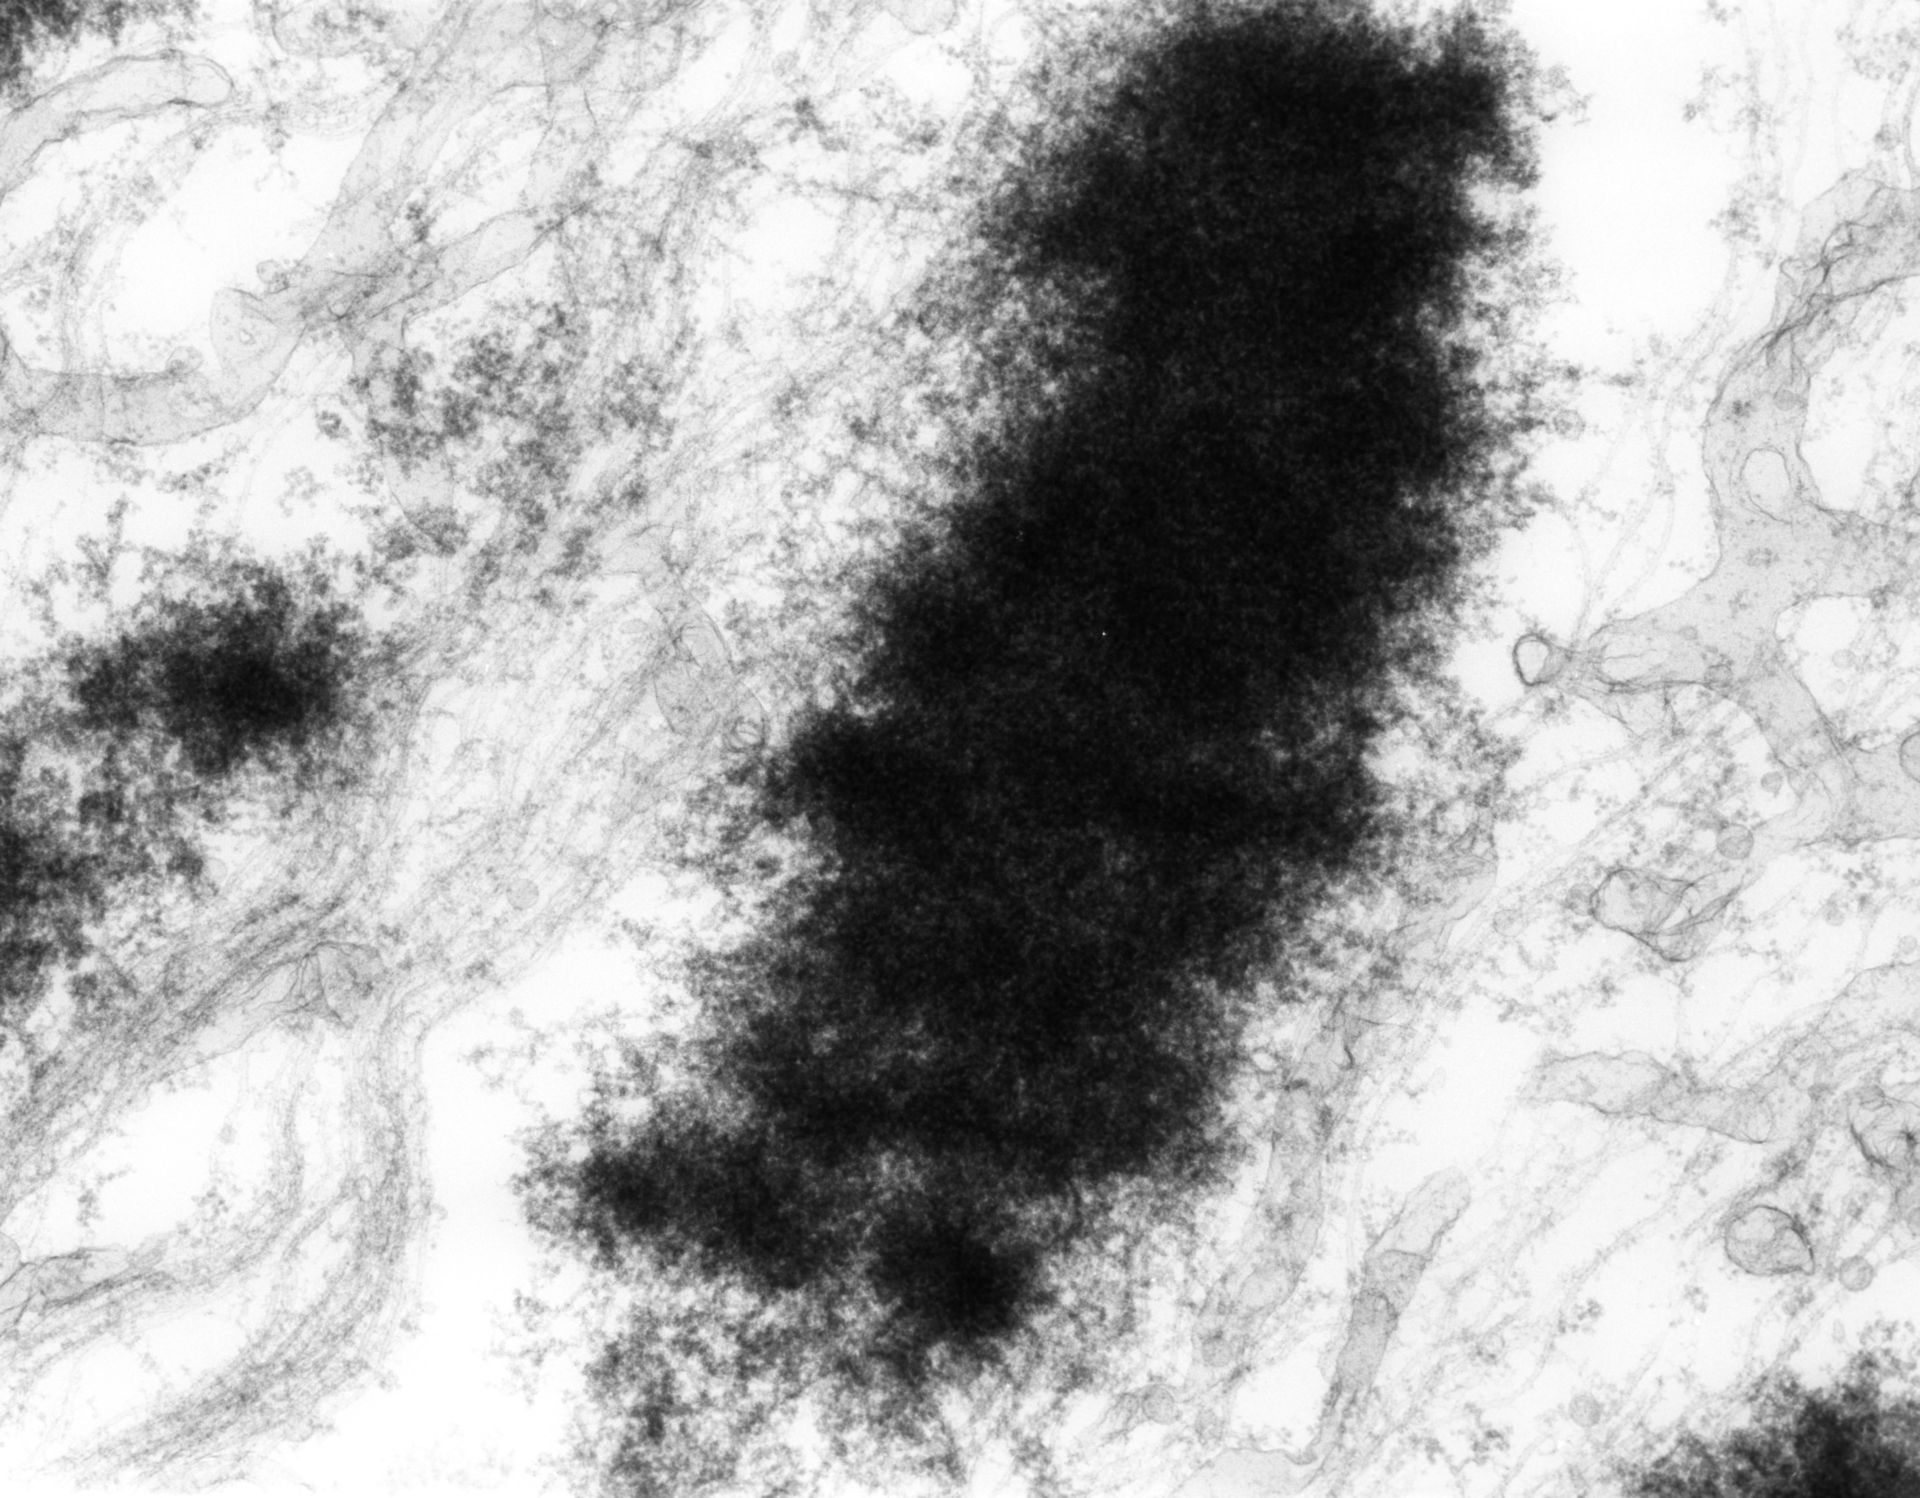 Haemanthus katharinae (Nuclear chromosome) - CIL:11856